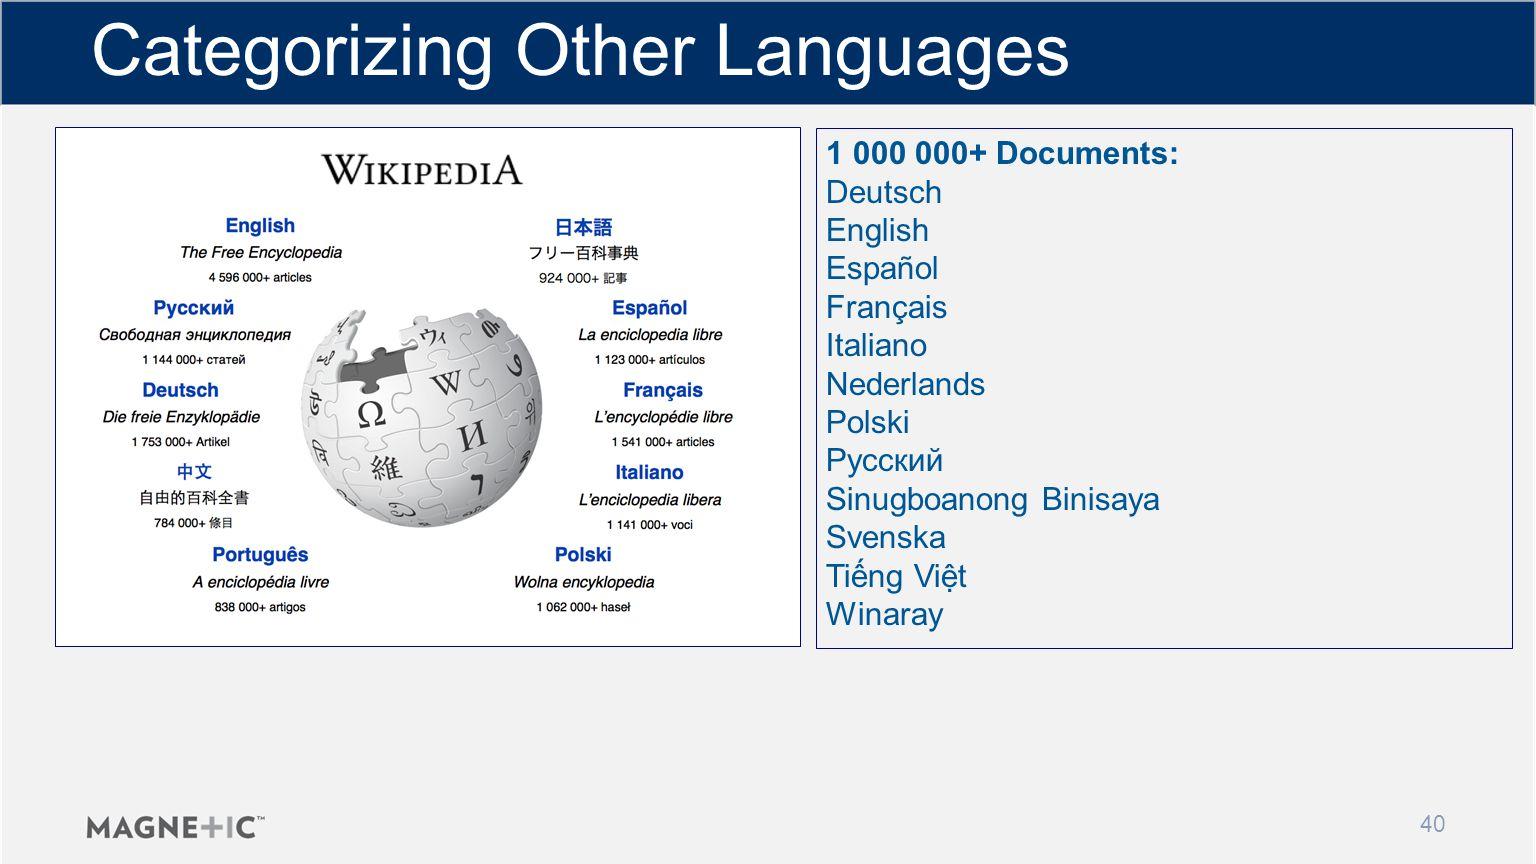 40 Categorizing Other Languages 1 000 000+ Documents: Deutsch English Español Français Italiano Nederlands Polski Русский Sinugboanong Binisaya Svensk